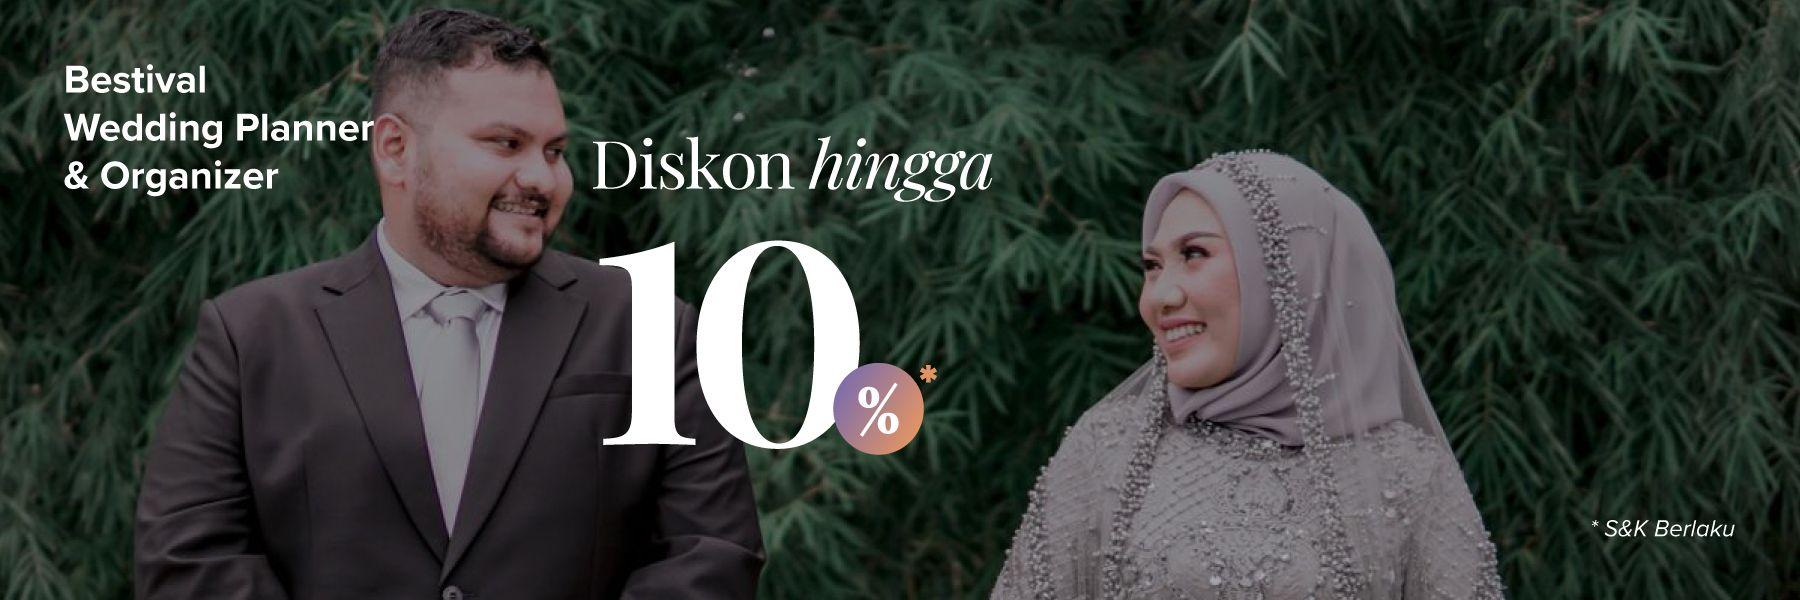 Hemat Hingga 1 Juta Rupiah Hanya di Bestival Wedding Planner